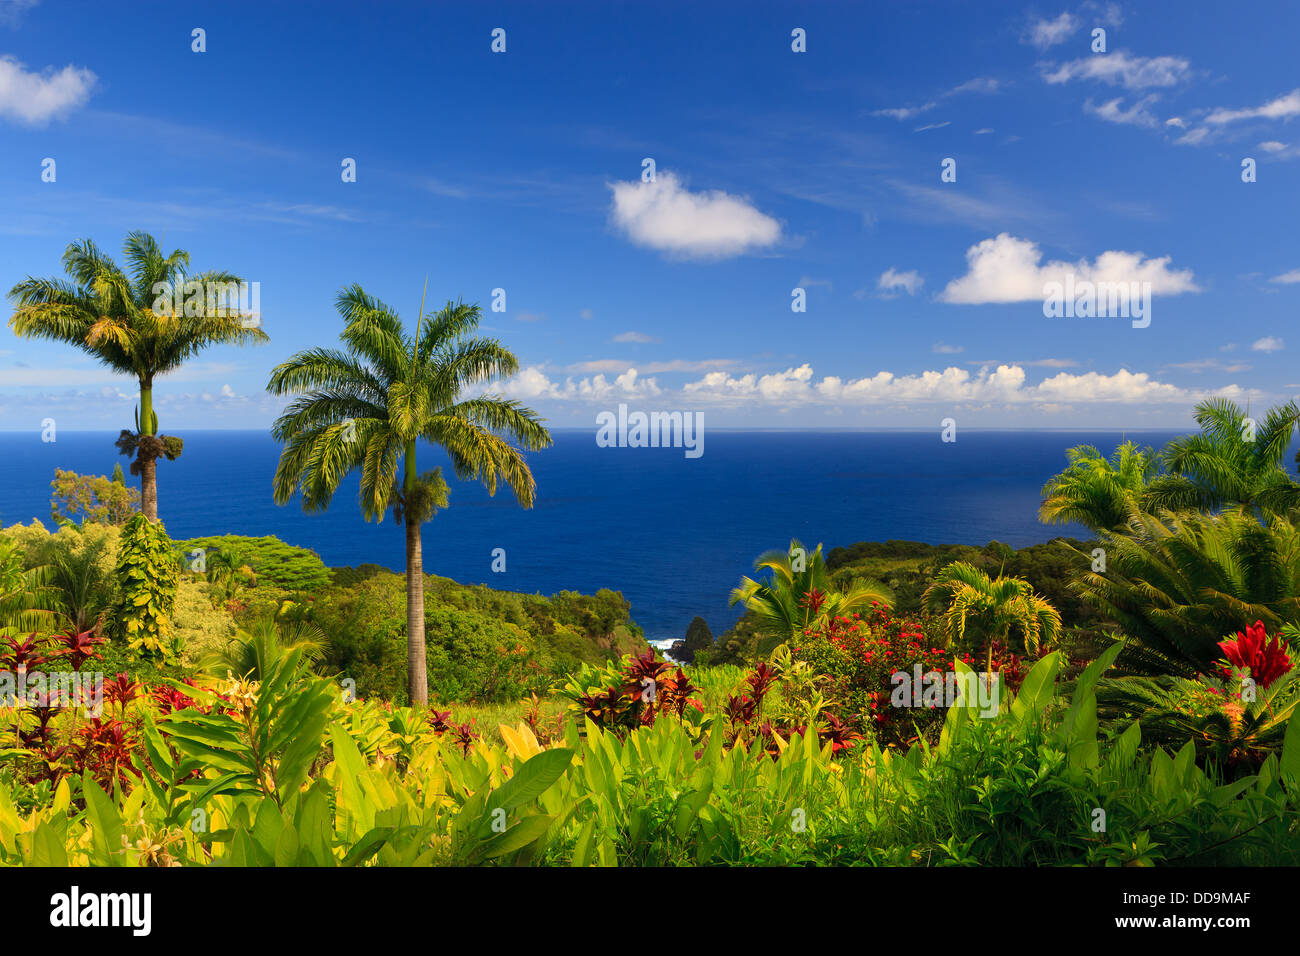 ocean-view-from-the-garden-of-eden-maui-